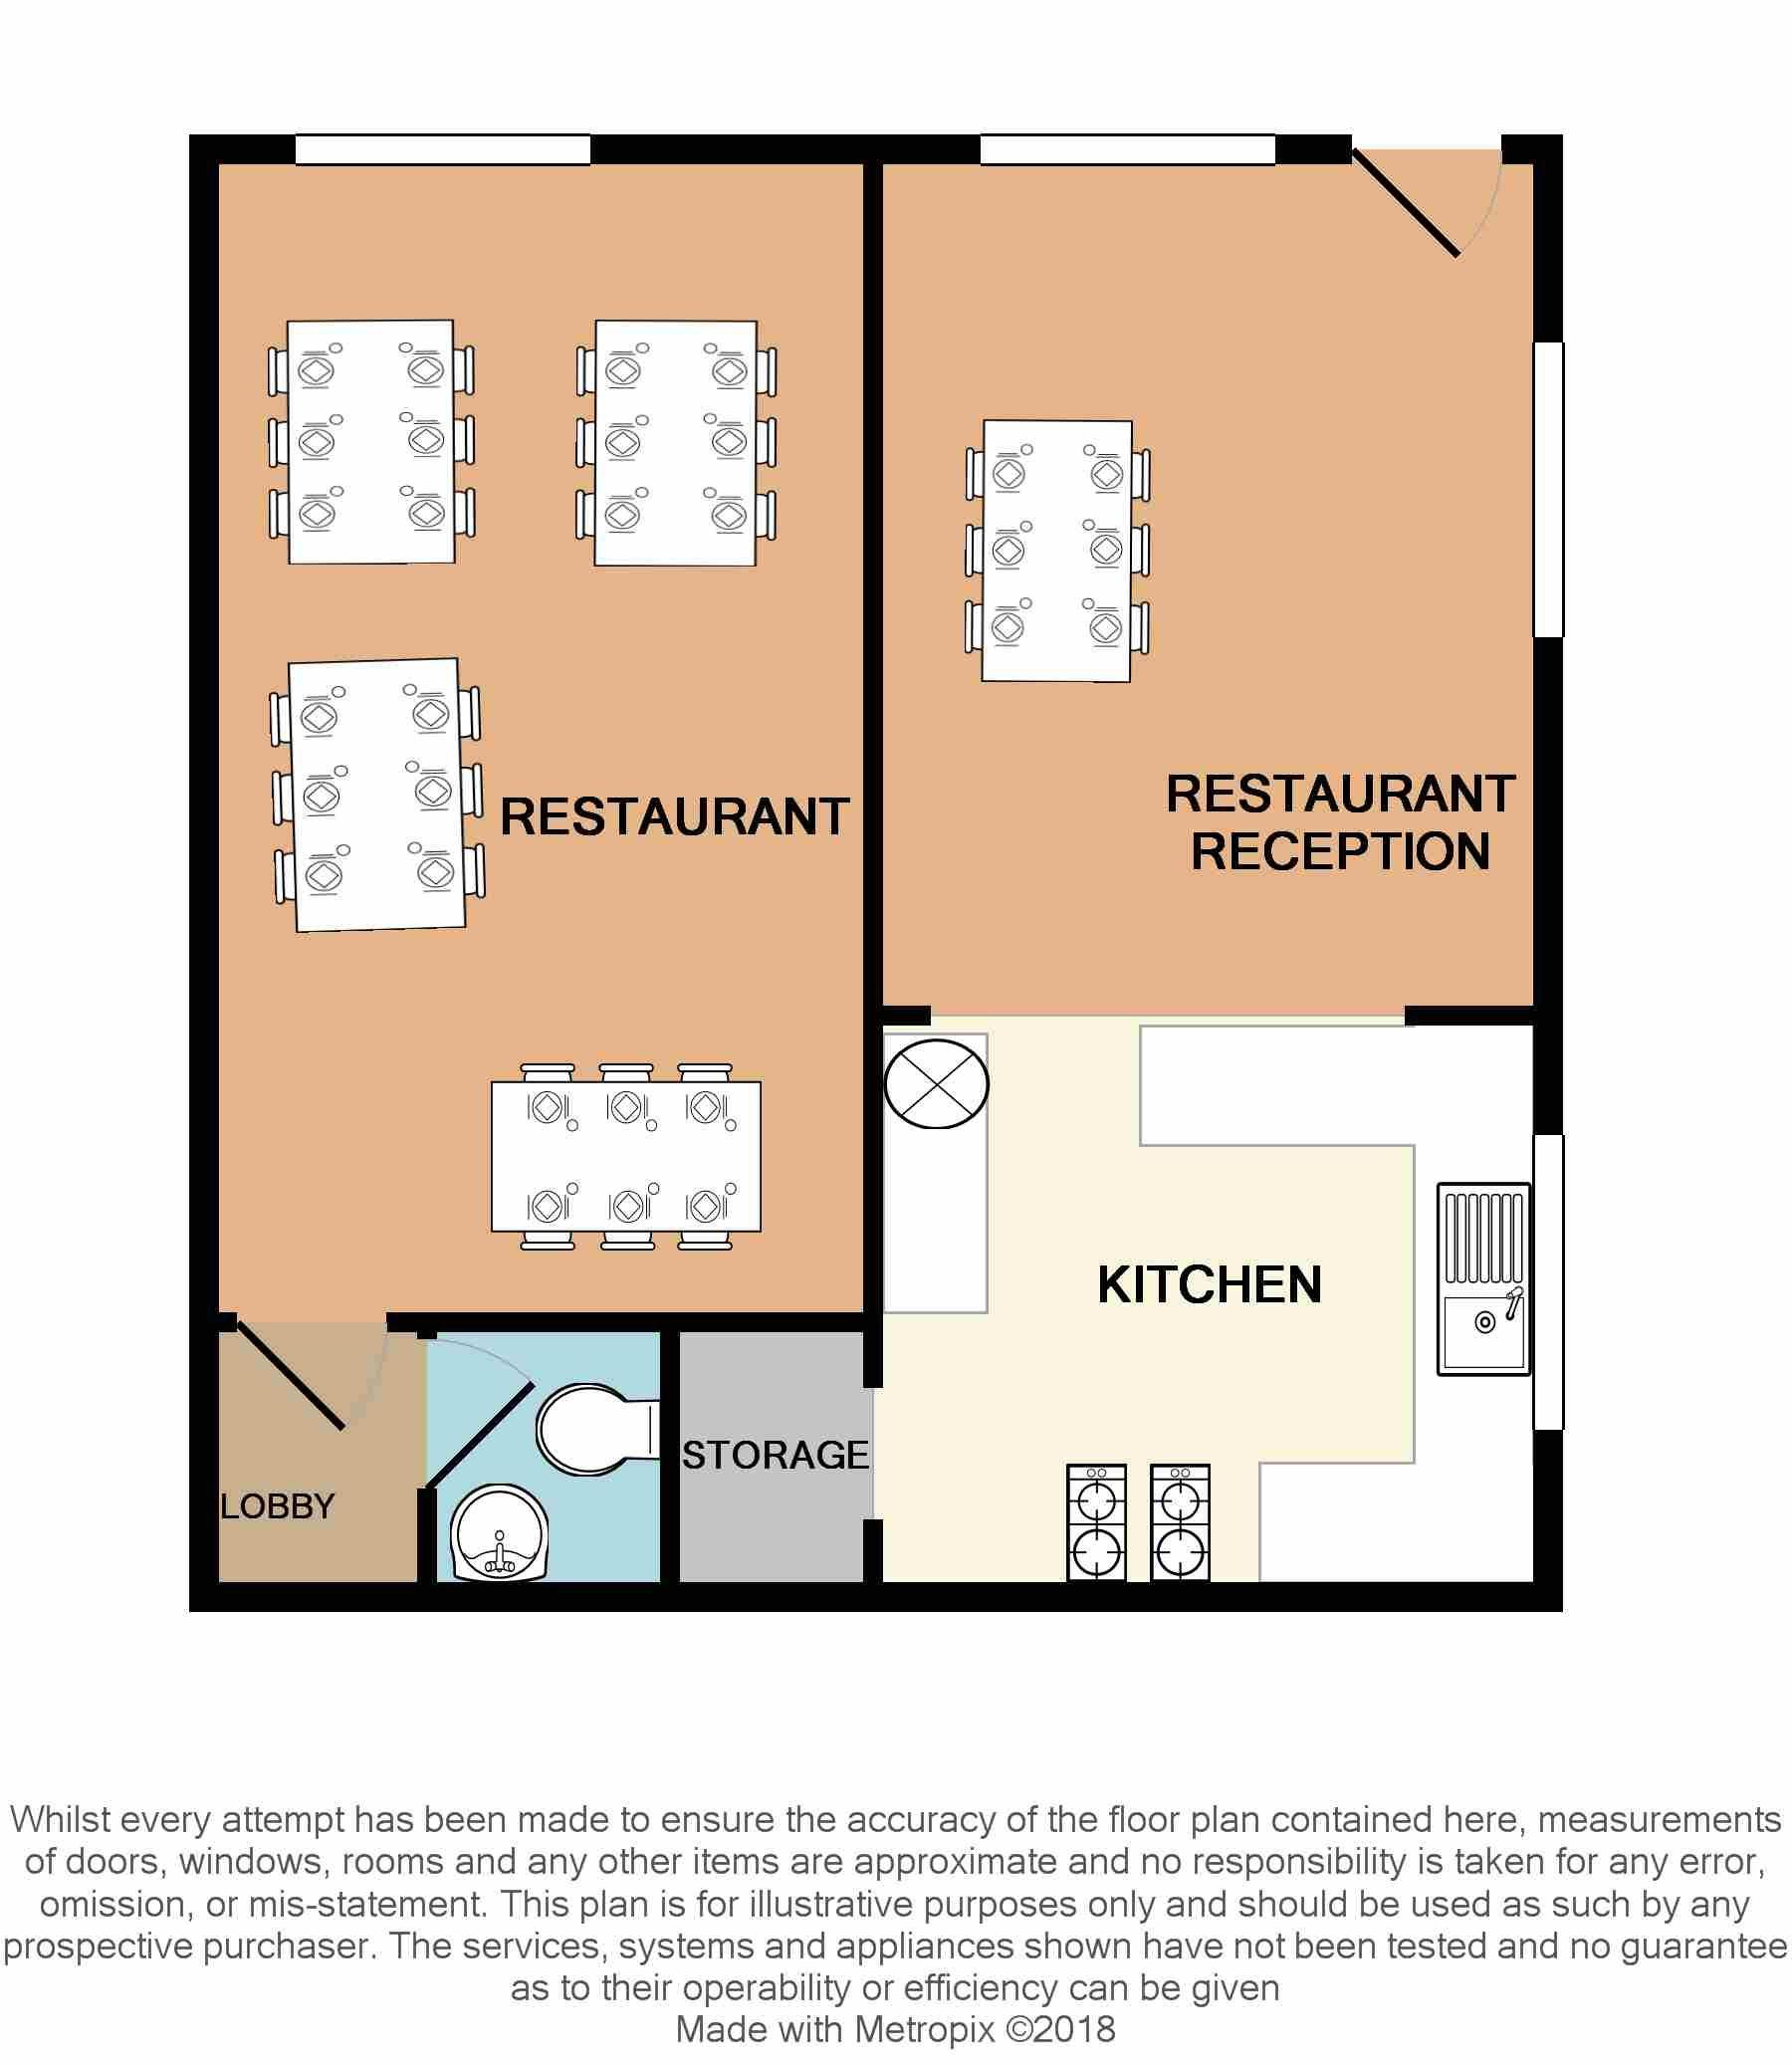 Restaurant For Sale - Floorplan 1